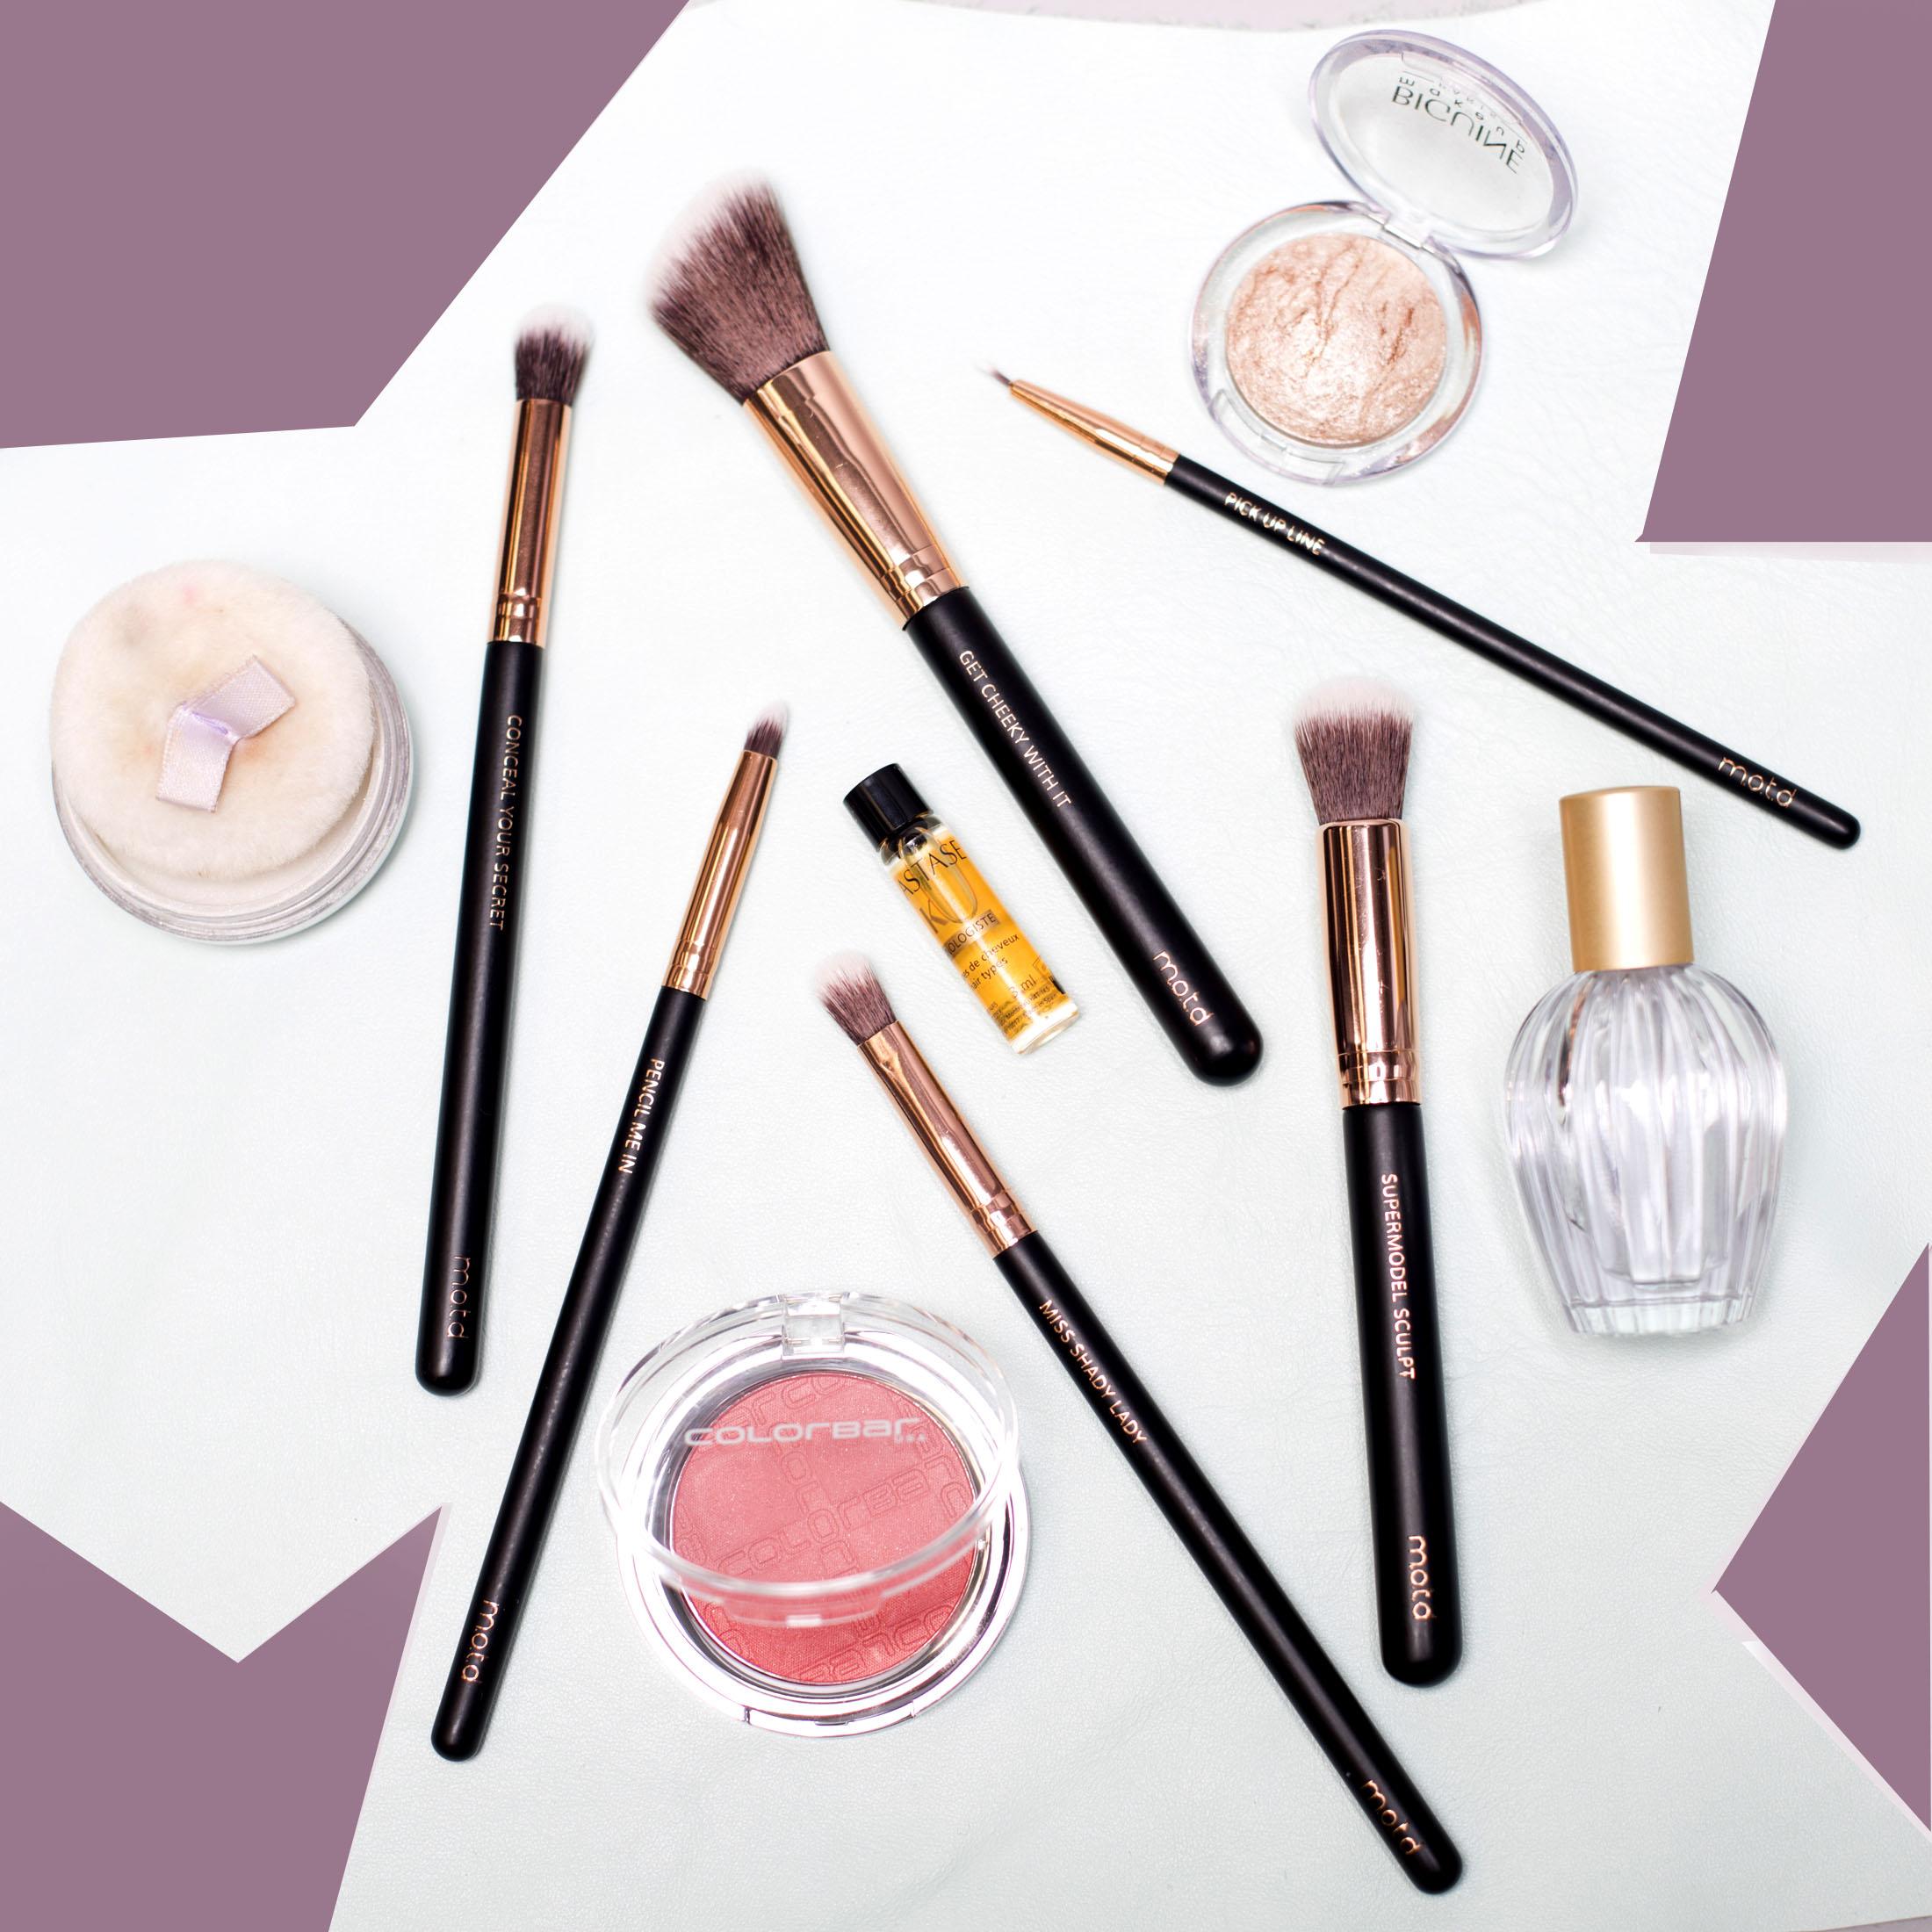 MOTD_Cosmetics-18.jpg